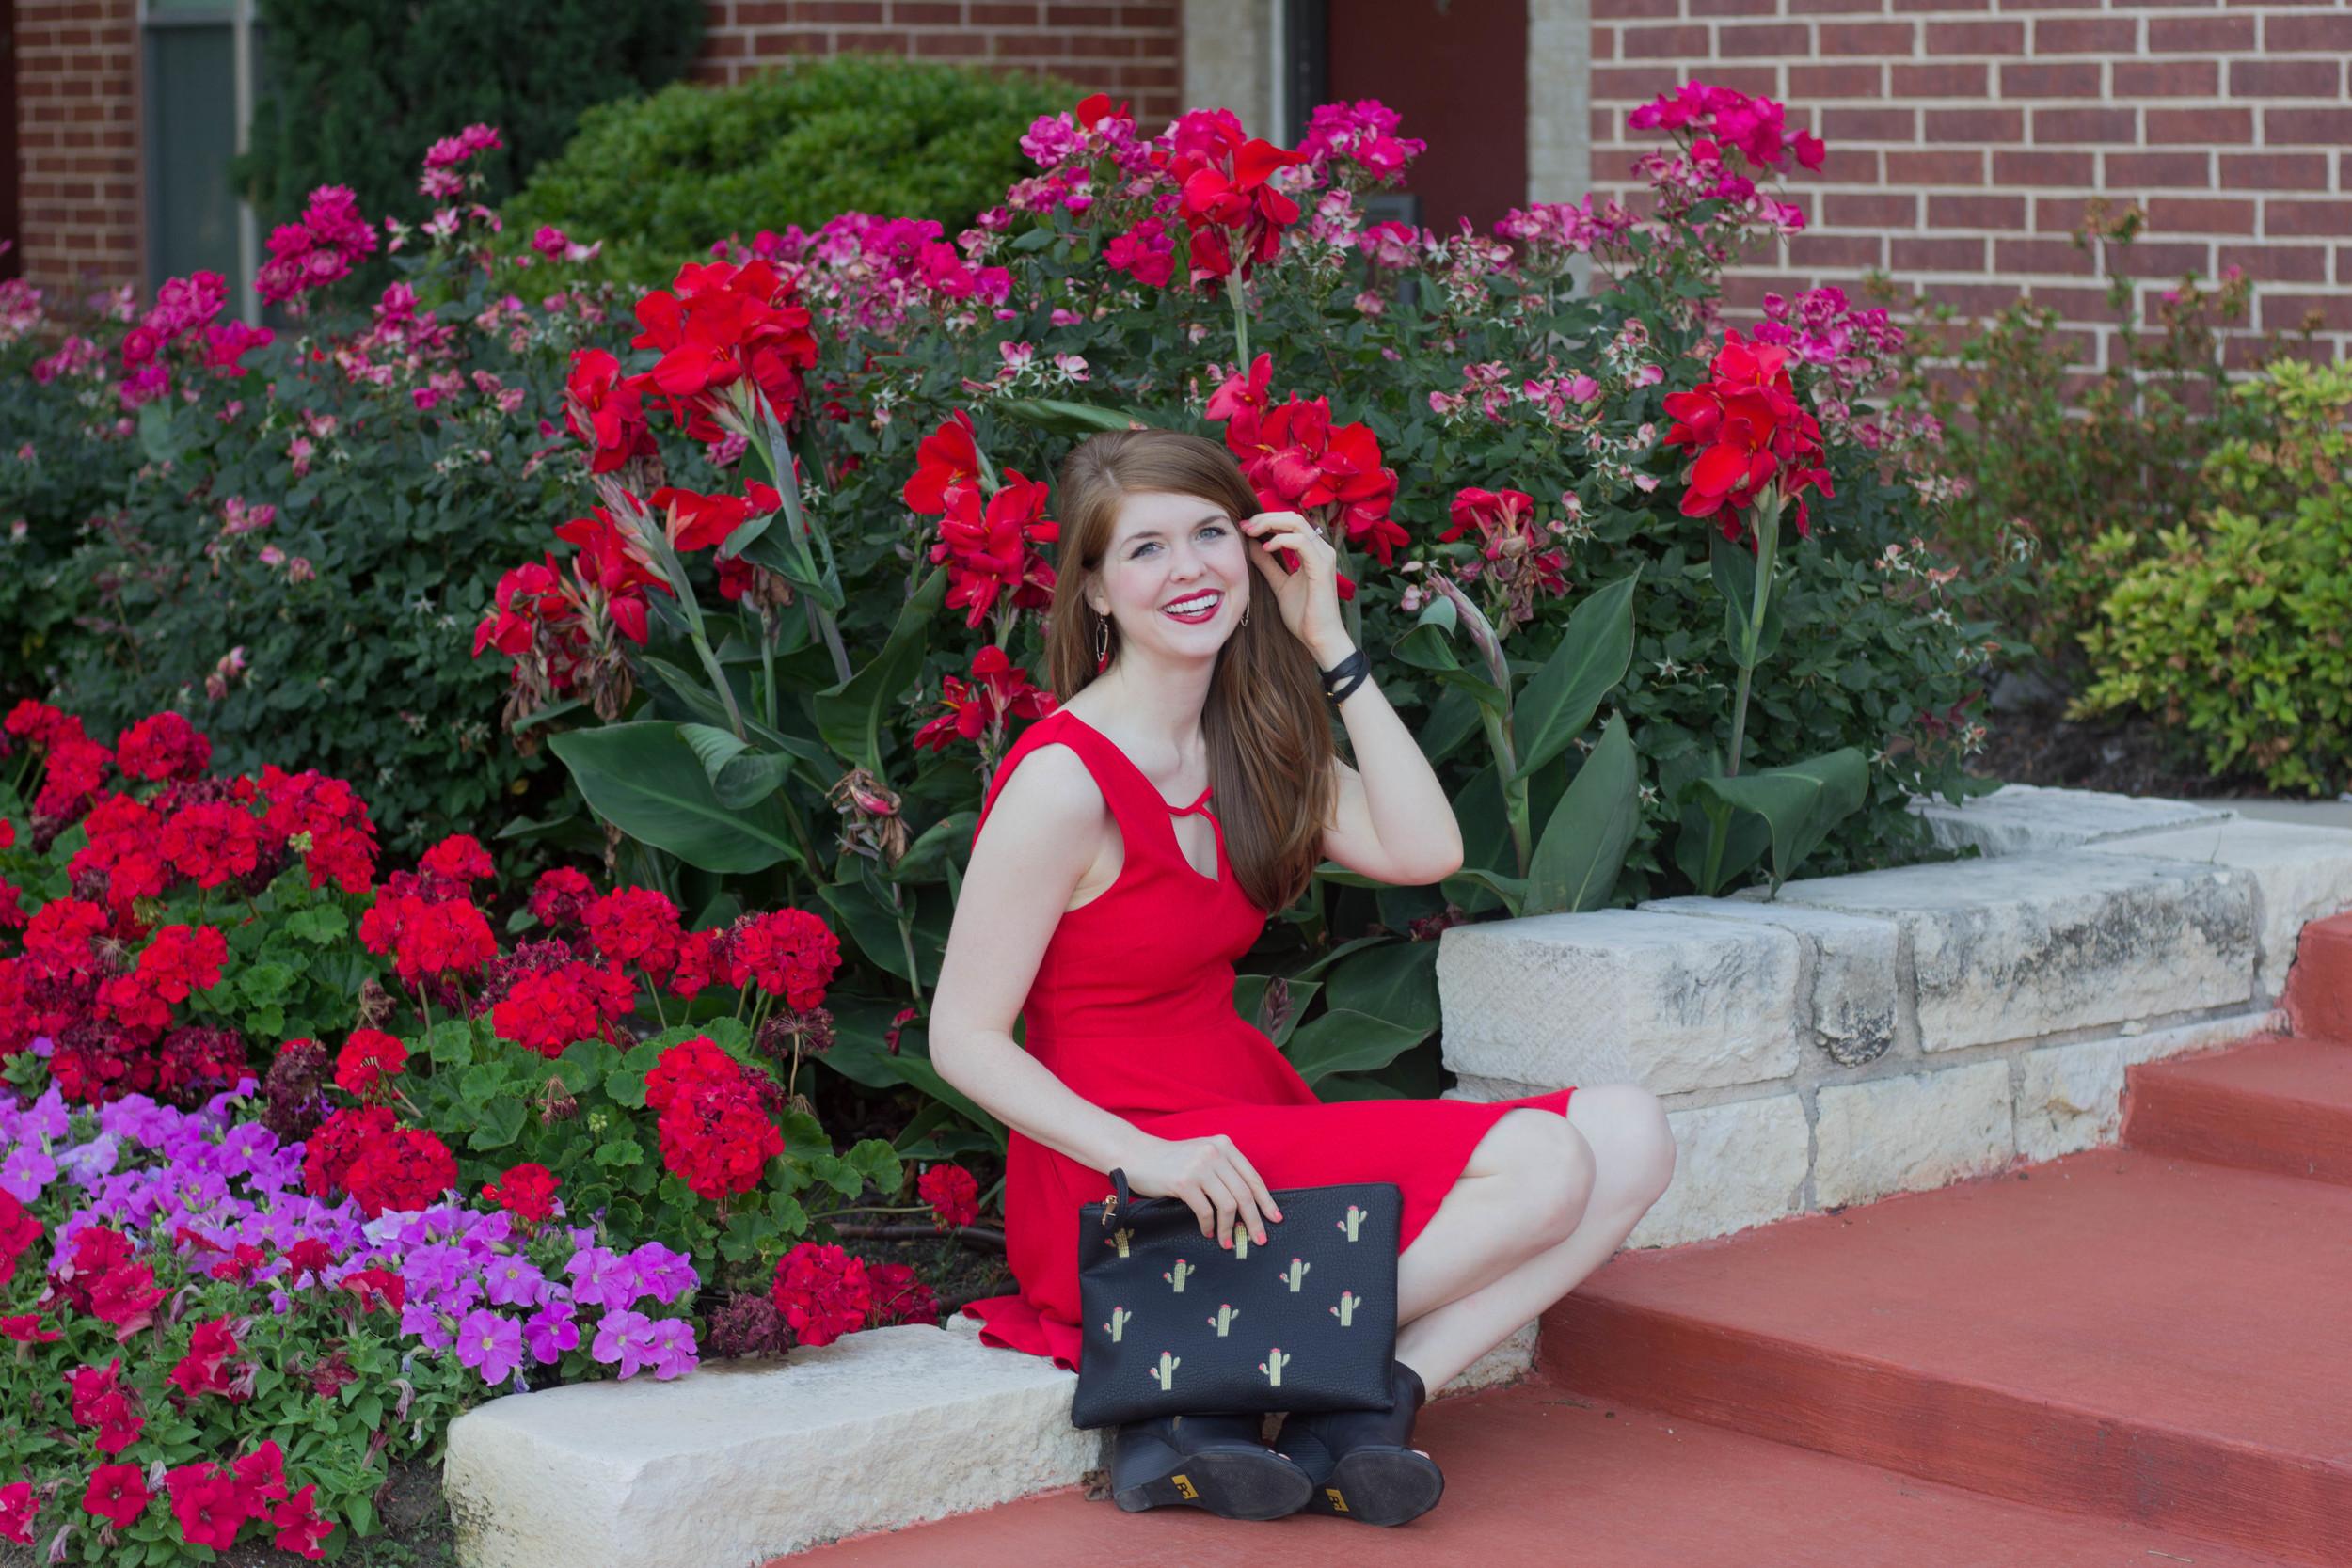 minkpink red dress, bc footwear wedges, street level le tote cactus clutch, kendra scott skylar earrings, nars manhunter lipstick. dancer emoji